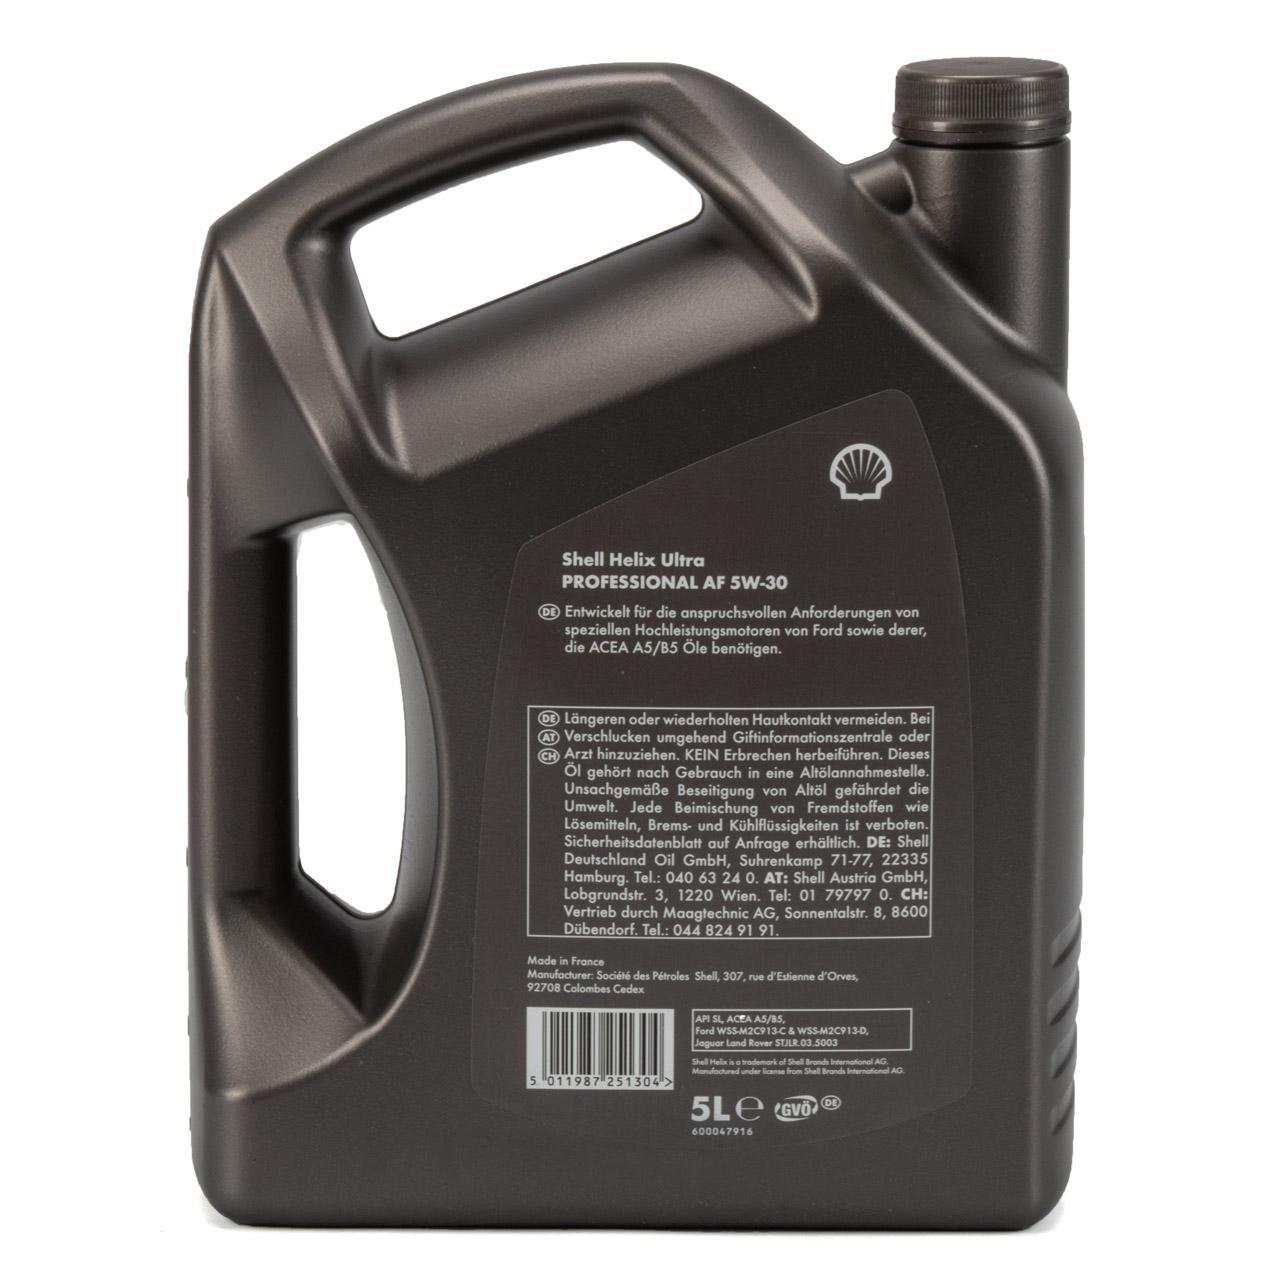 SHELL Motoröl Öl HELIX ULTRA Professional AF 5W30 Ford WSS-M2C913-C/-D - 5 Liter